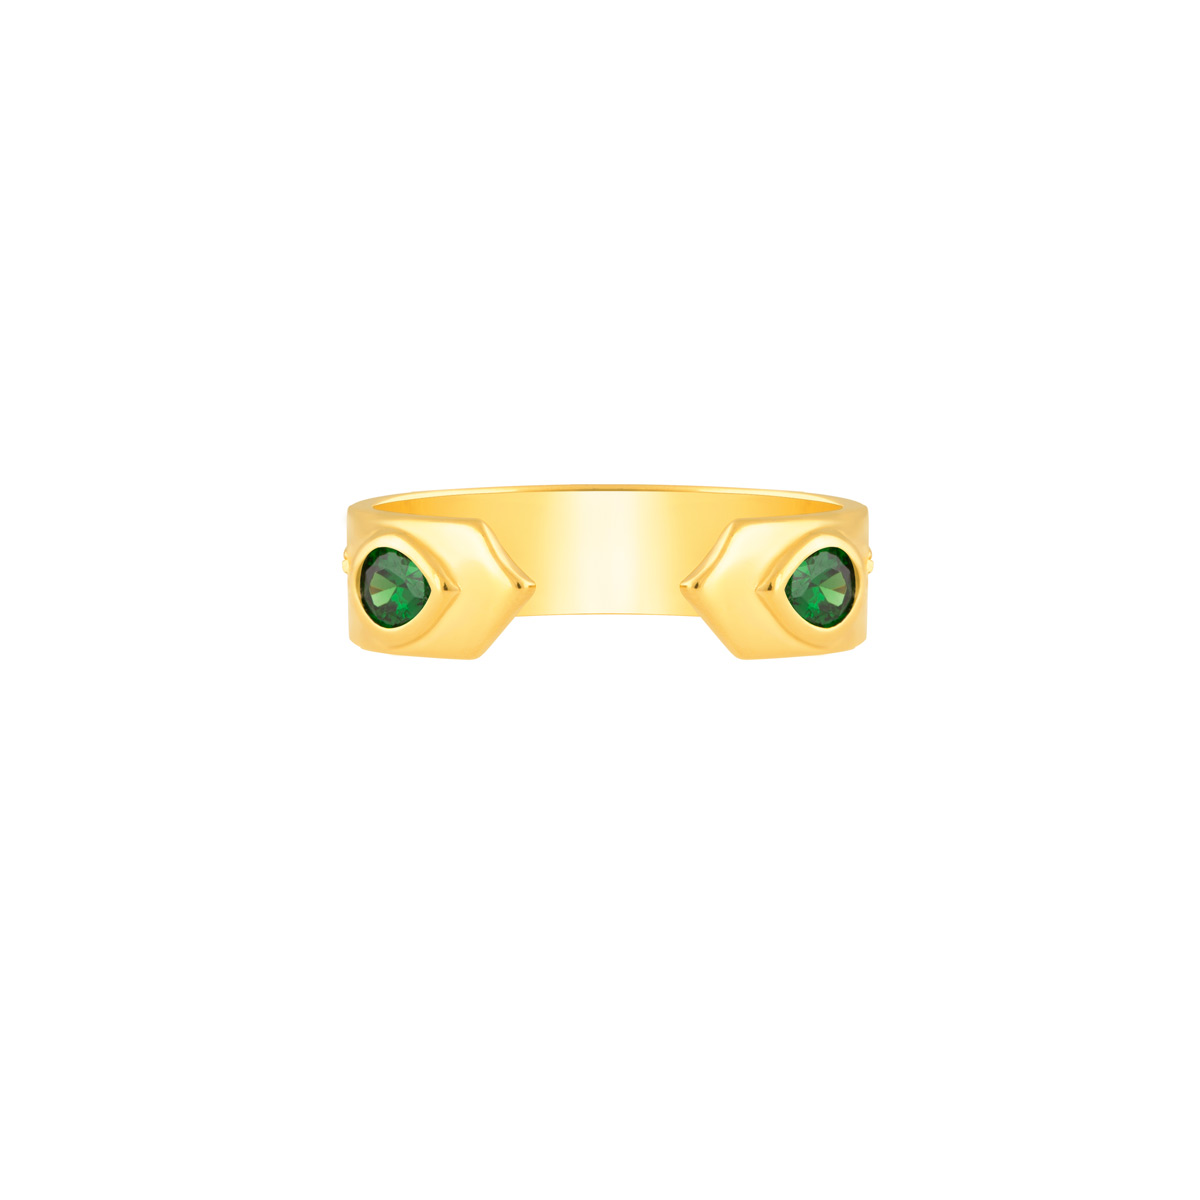 انگشتر طلا دو اشک سبز